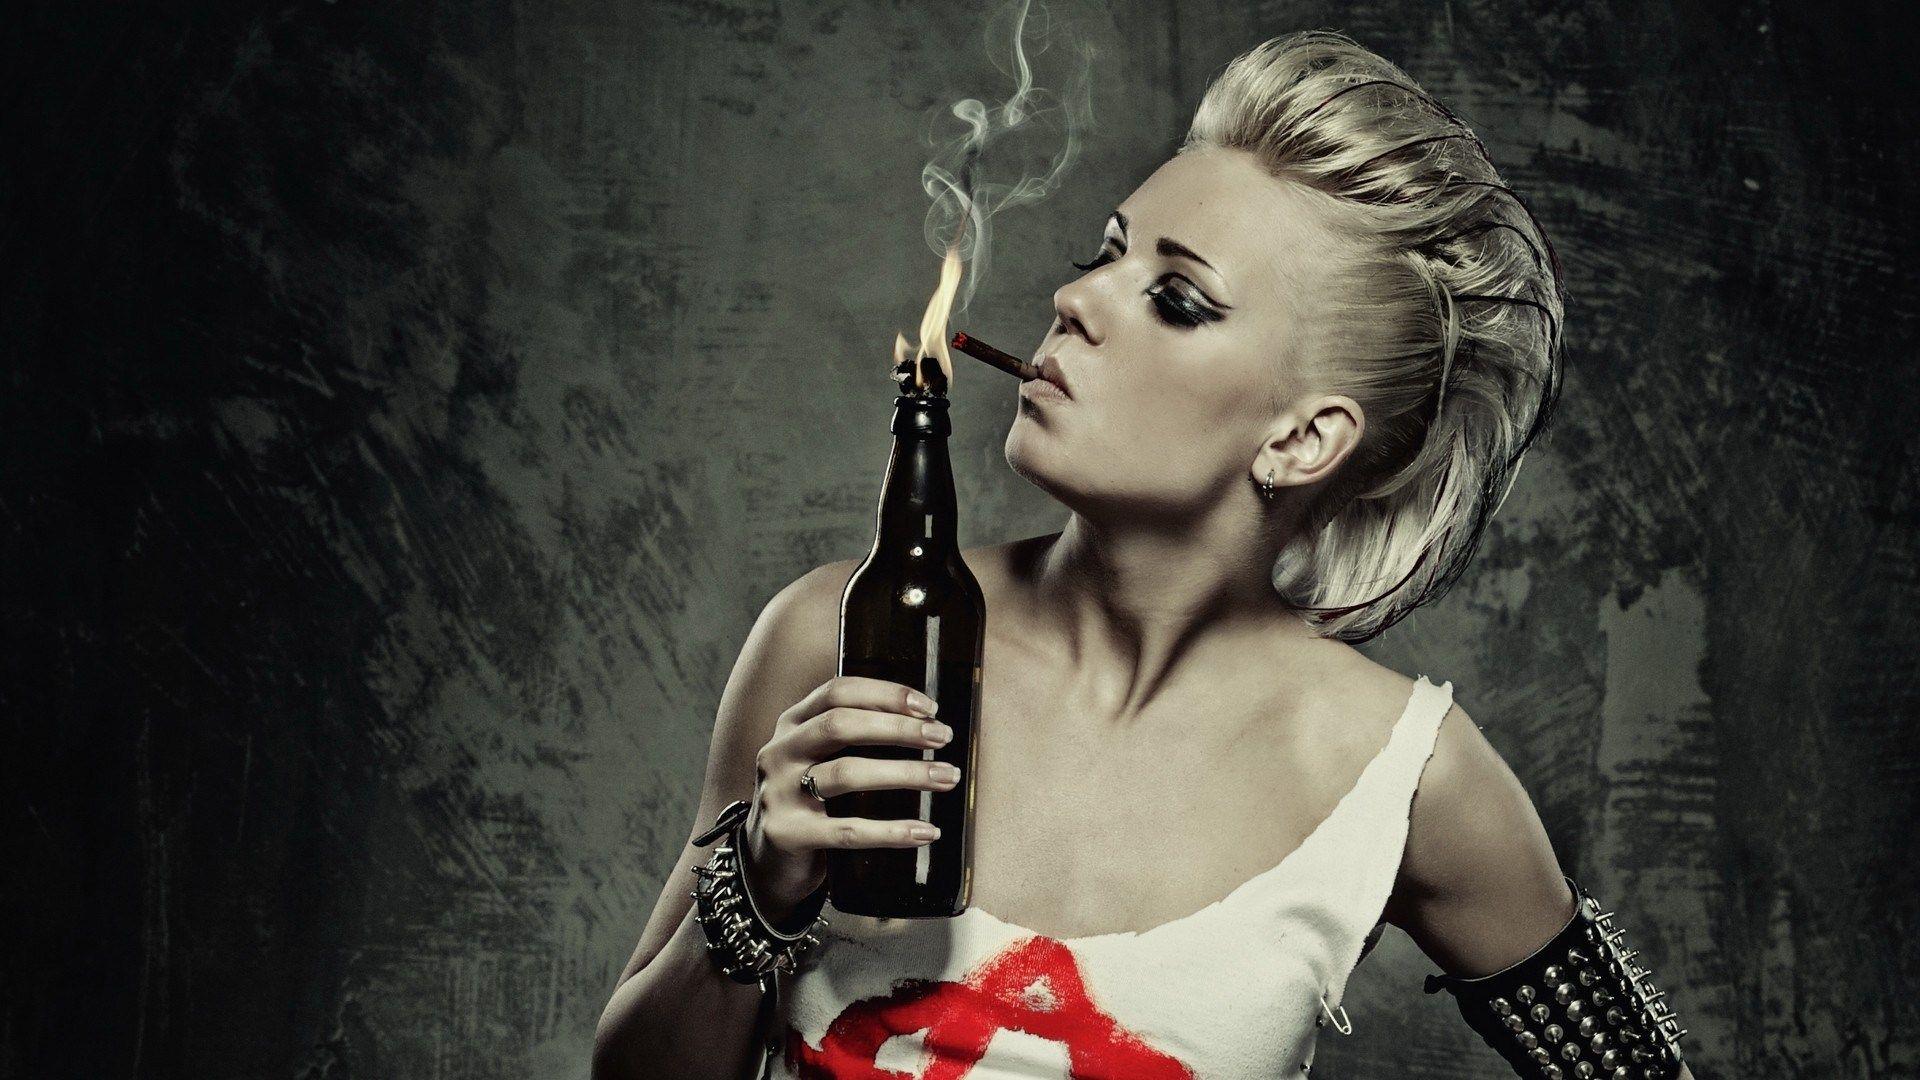 Pin by John Schollen on Brandflessen en Molotov Cocktails | Pinterest